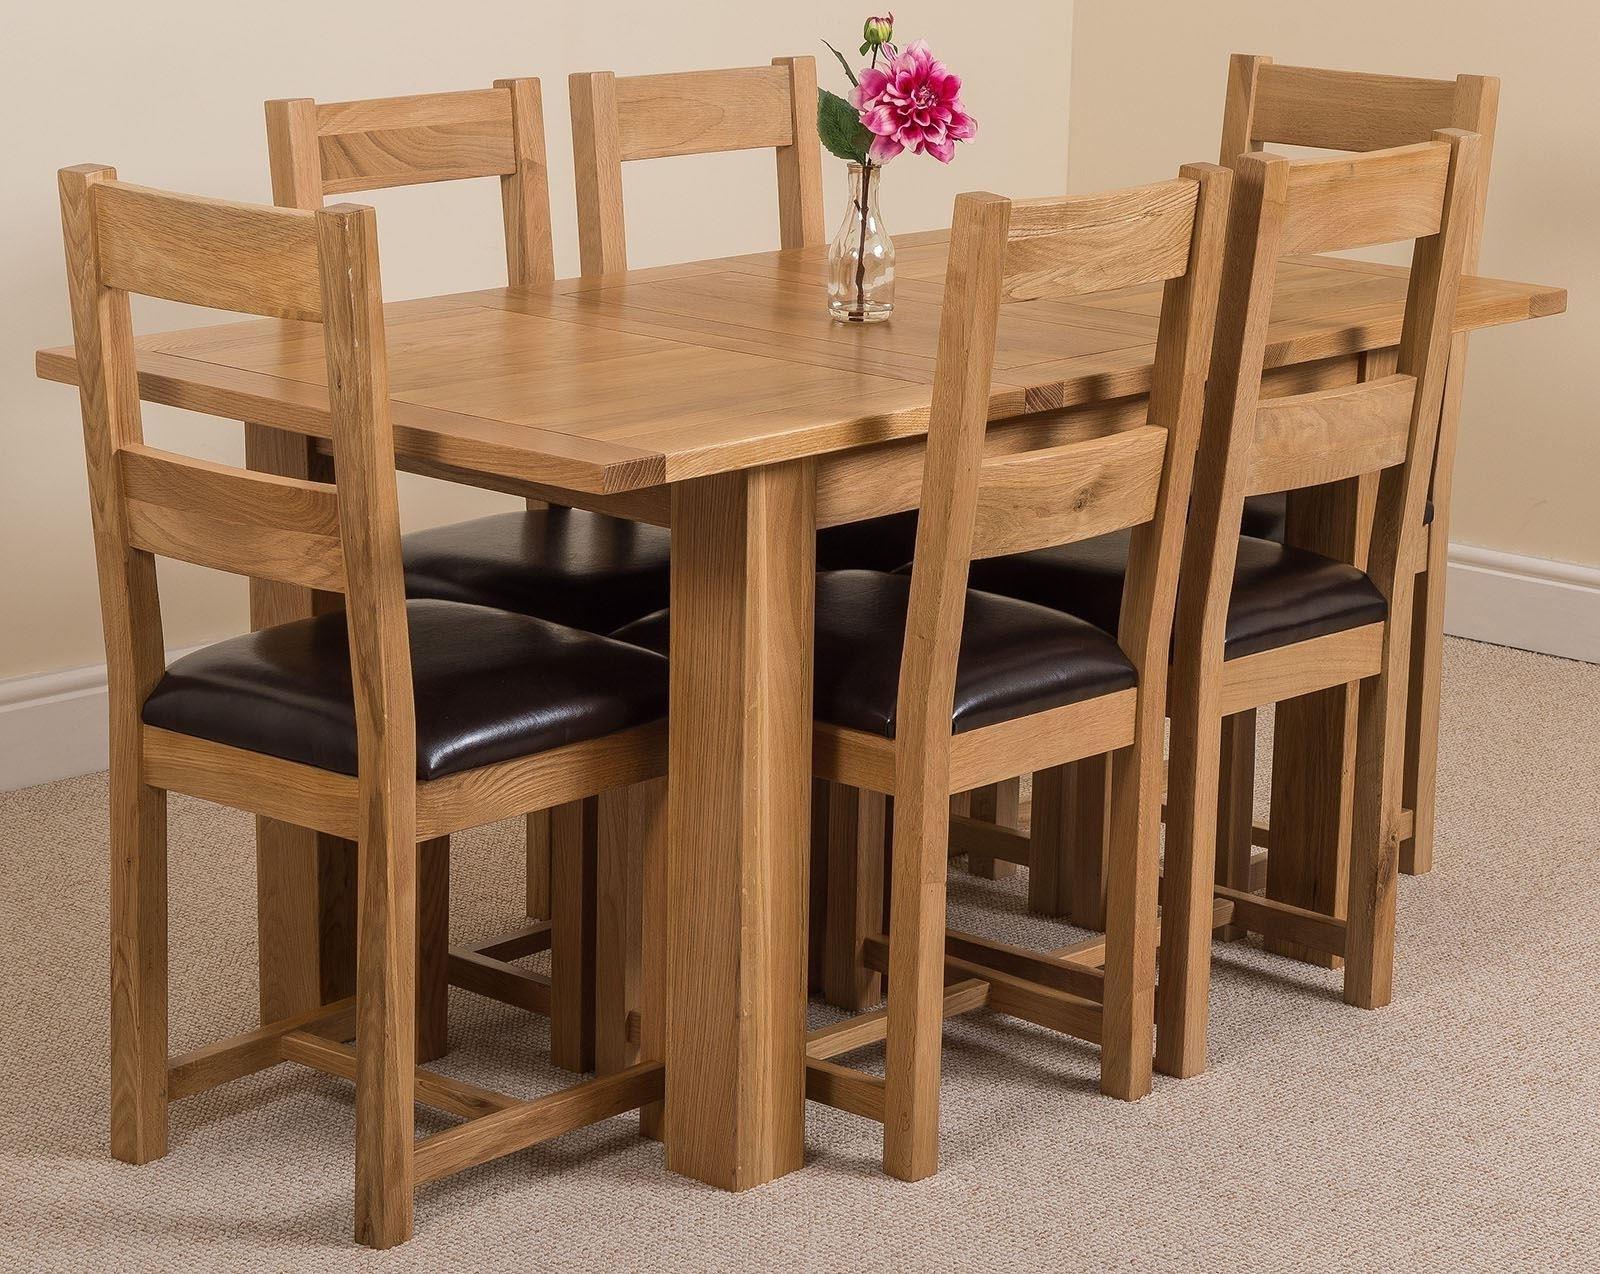 Oak Furniture King (View 7 of 25)